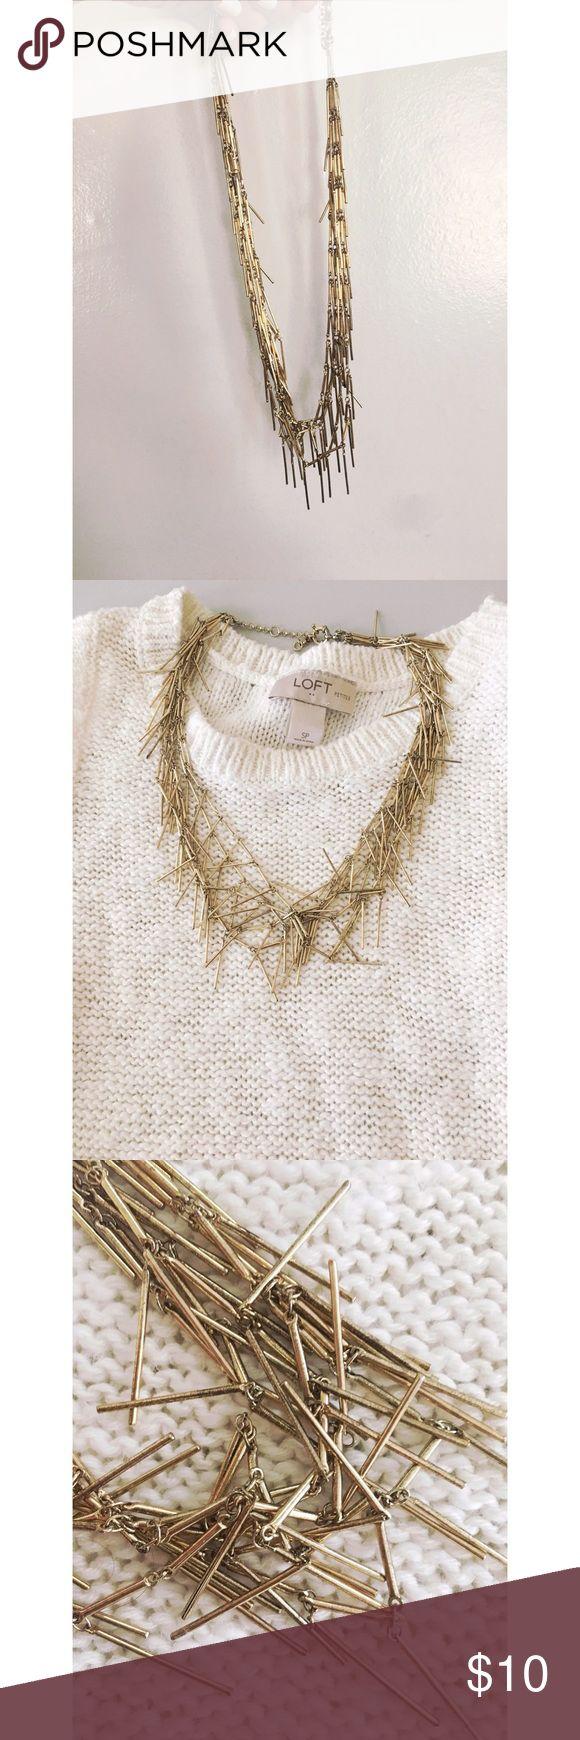 J Crew Factory Gold tassel necklace J Crew factory gold necklace in used condition J. Crew Factory Jewelry Necklaces